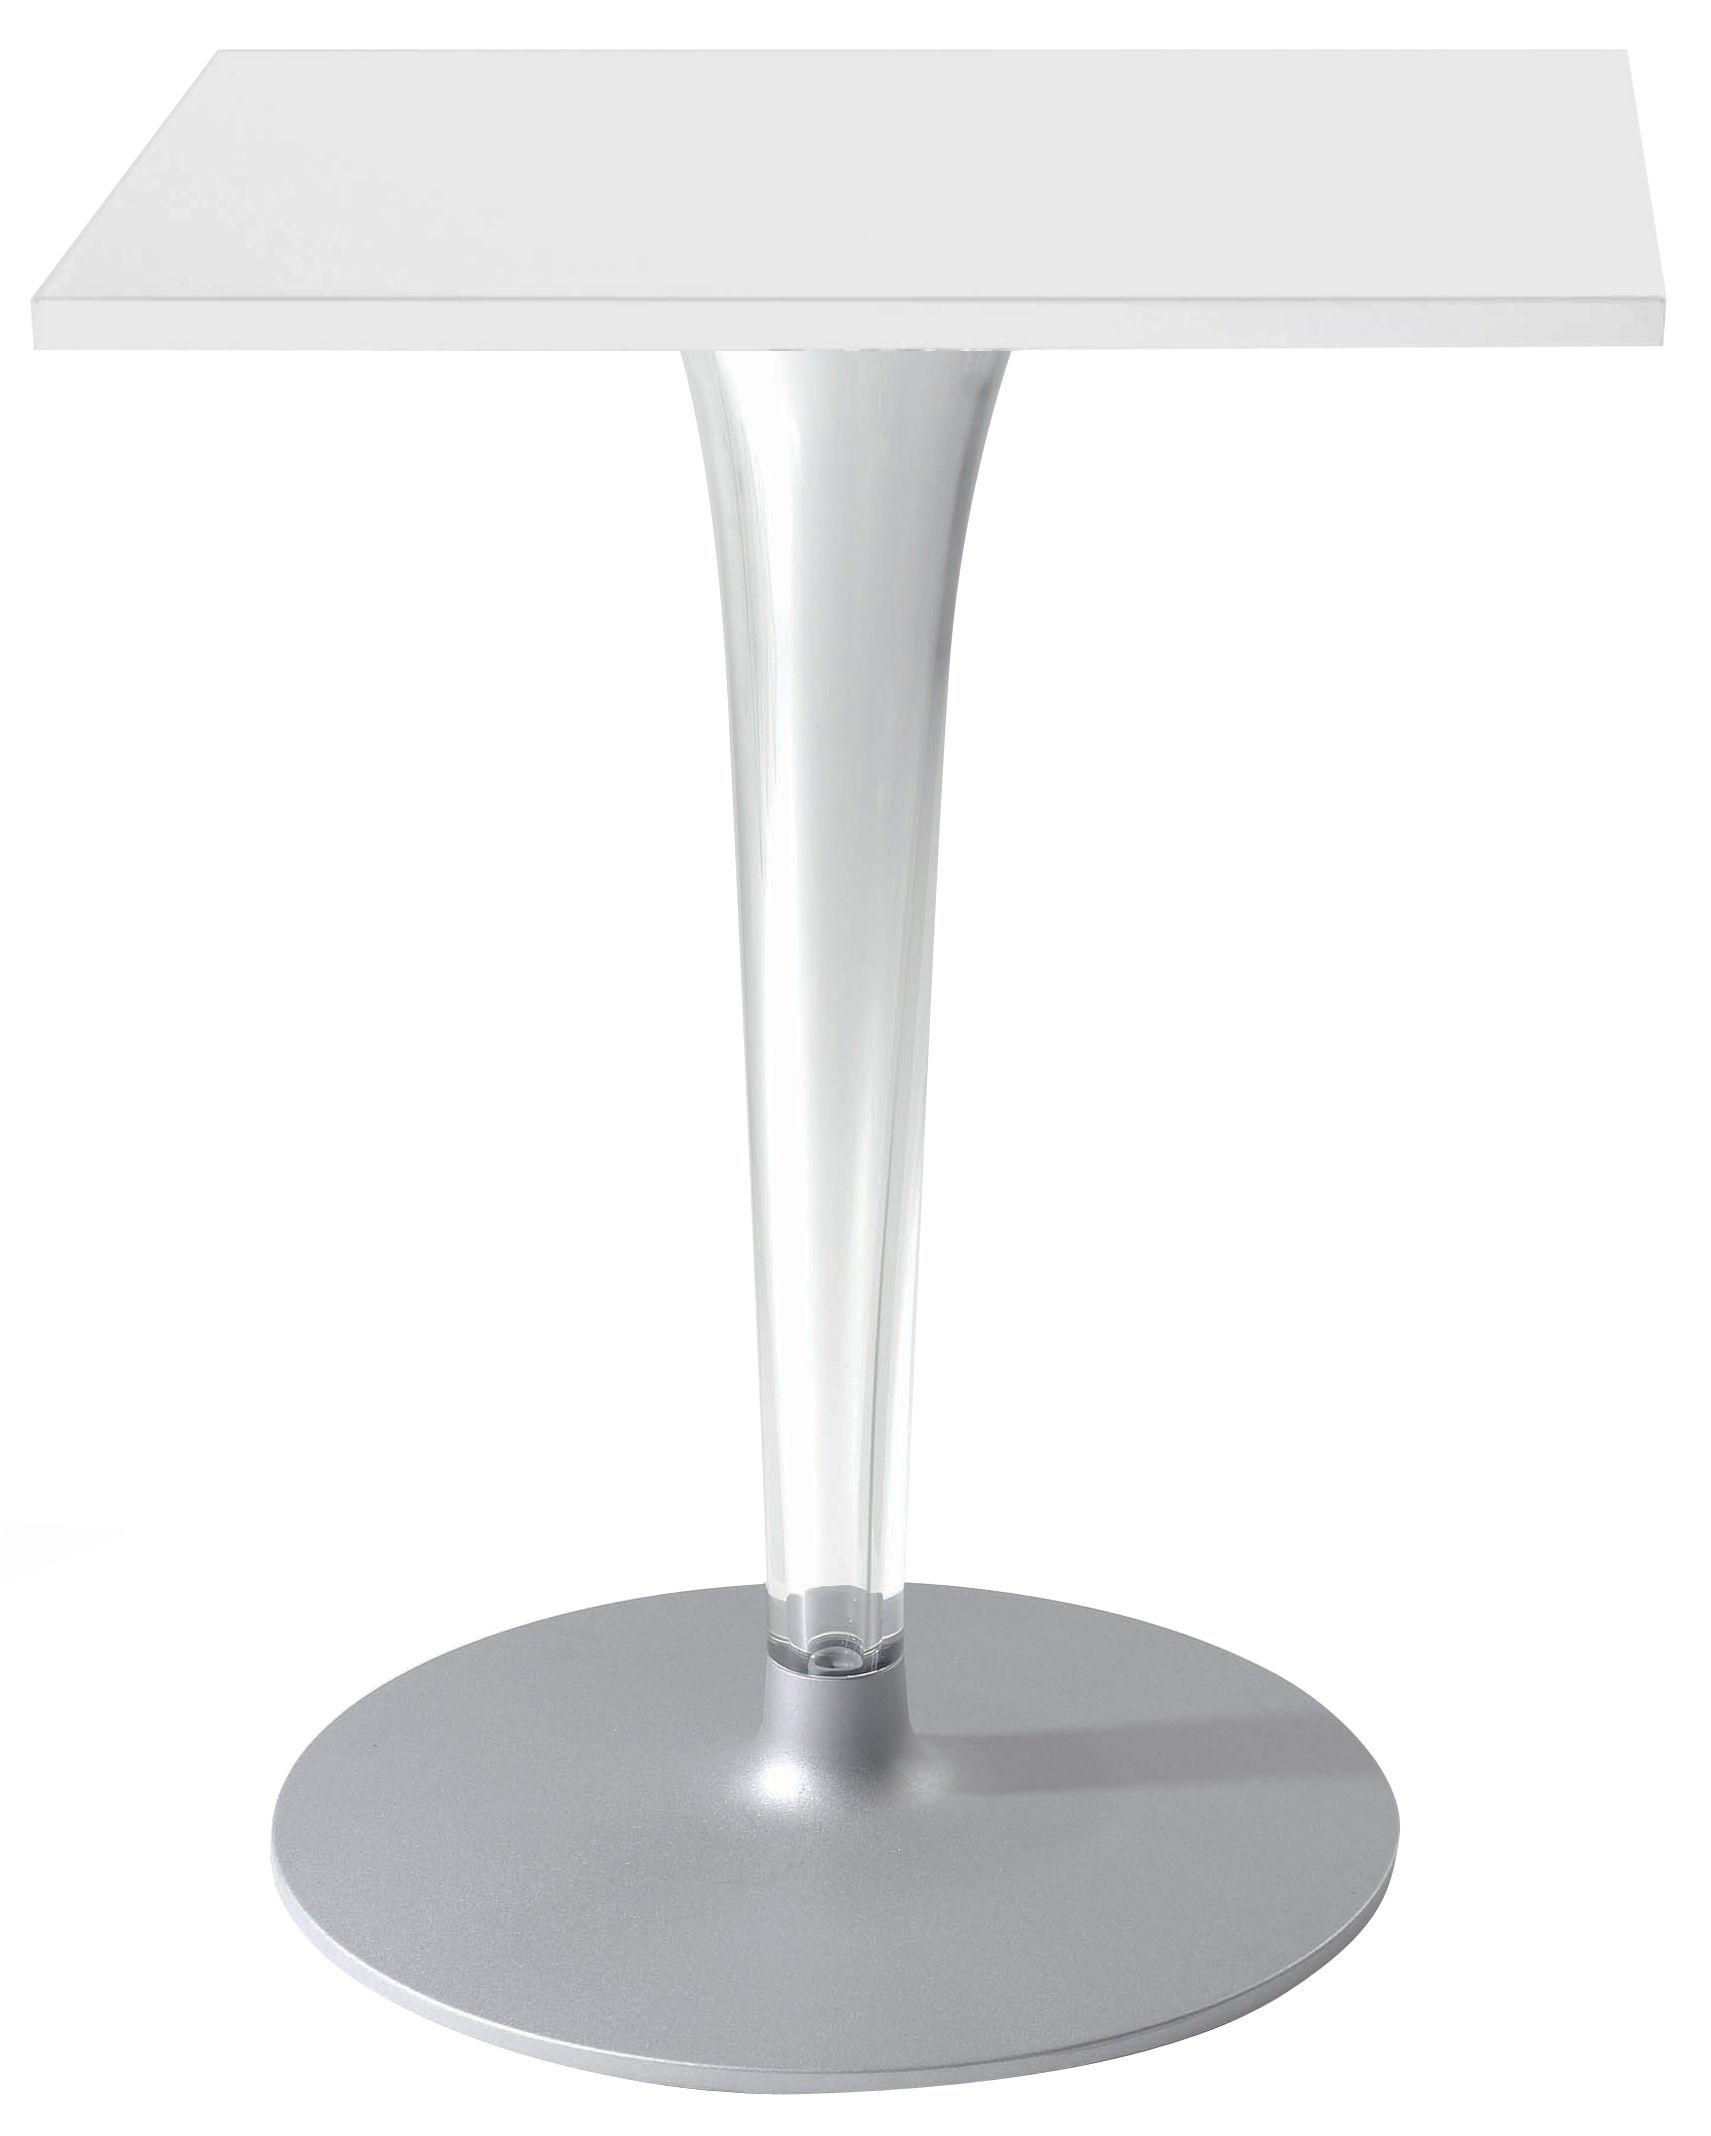 Jardin - Tables de jardin - Table de jardin Top Top - Contract outdoor / 70 x 70 cm - Kartell - Blanc/ pied rond - Aluminium verni, Mélamine, PMMA